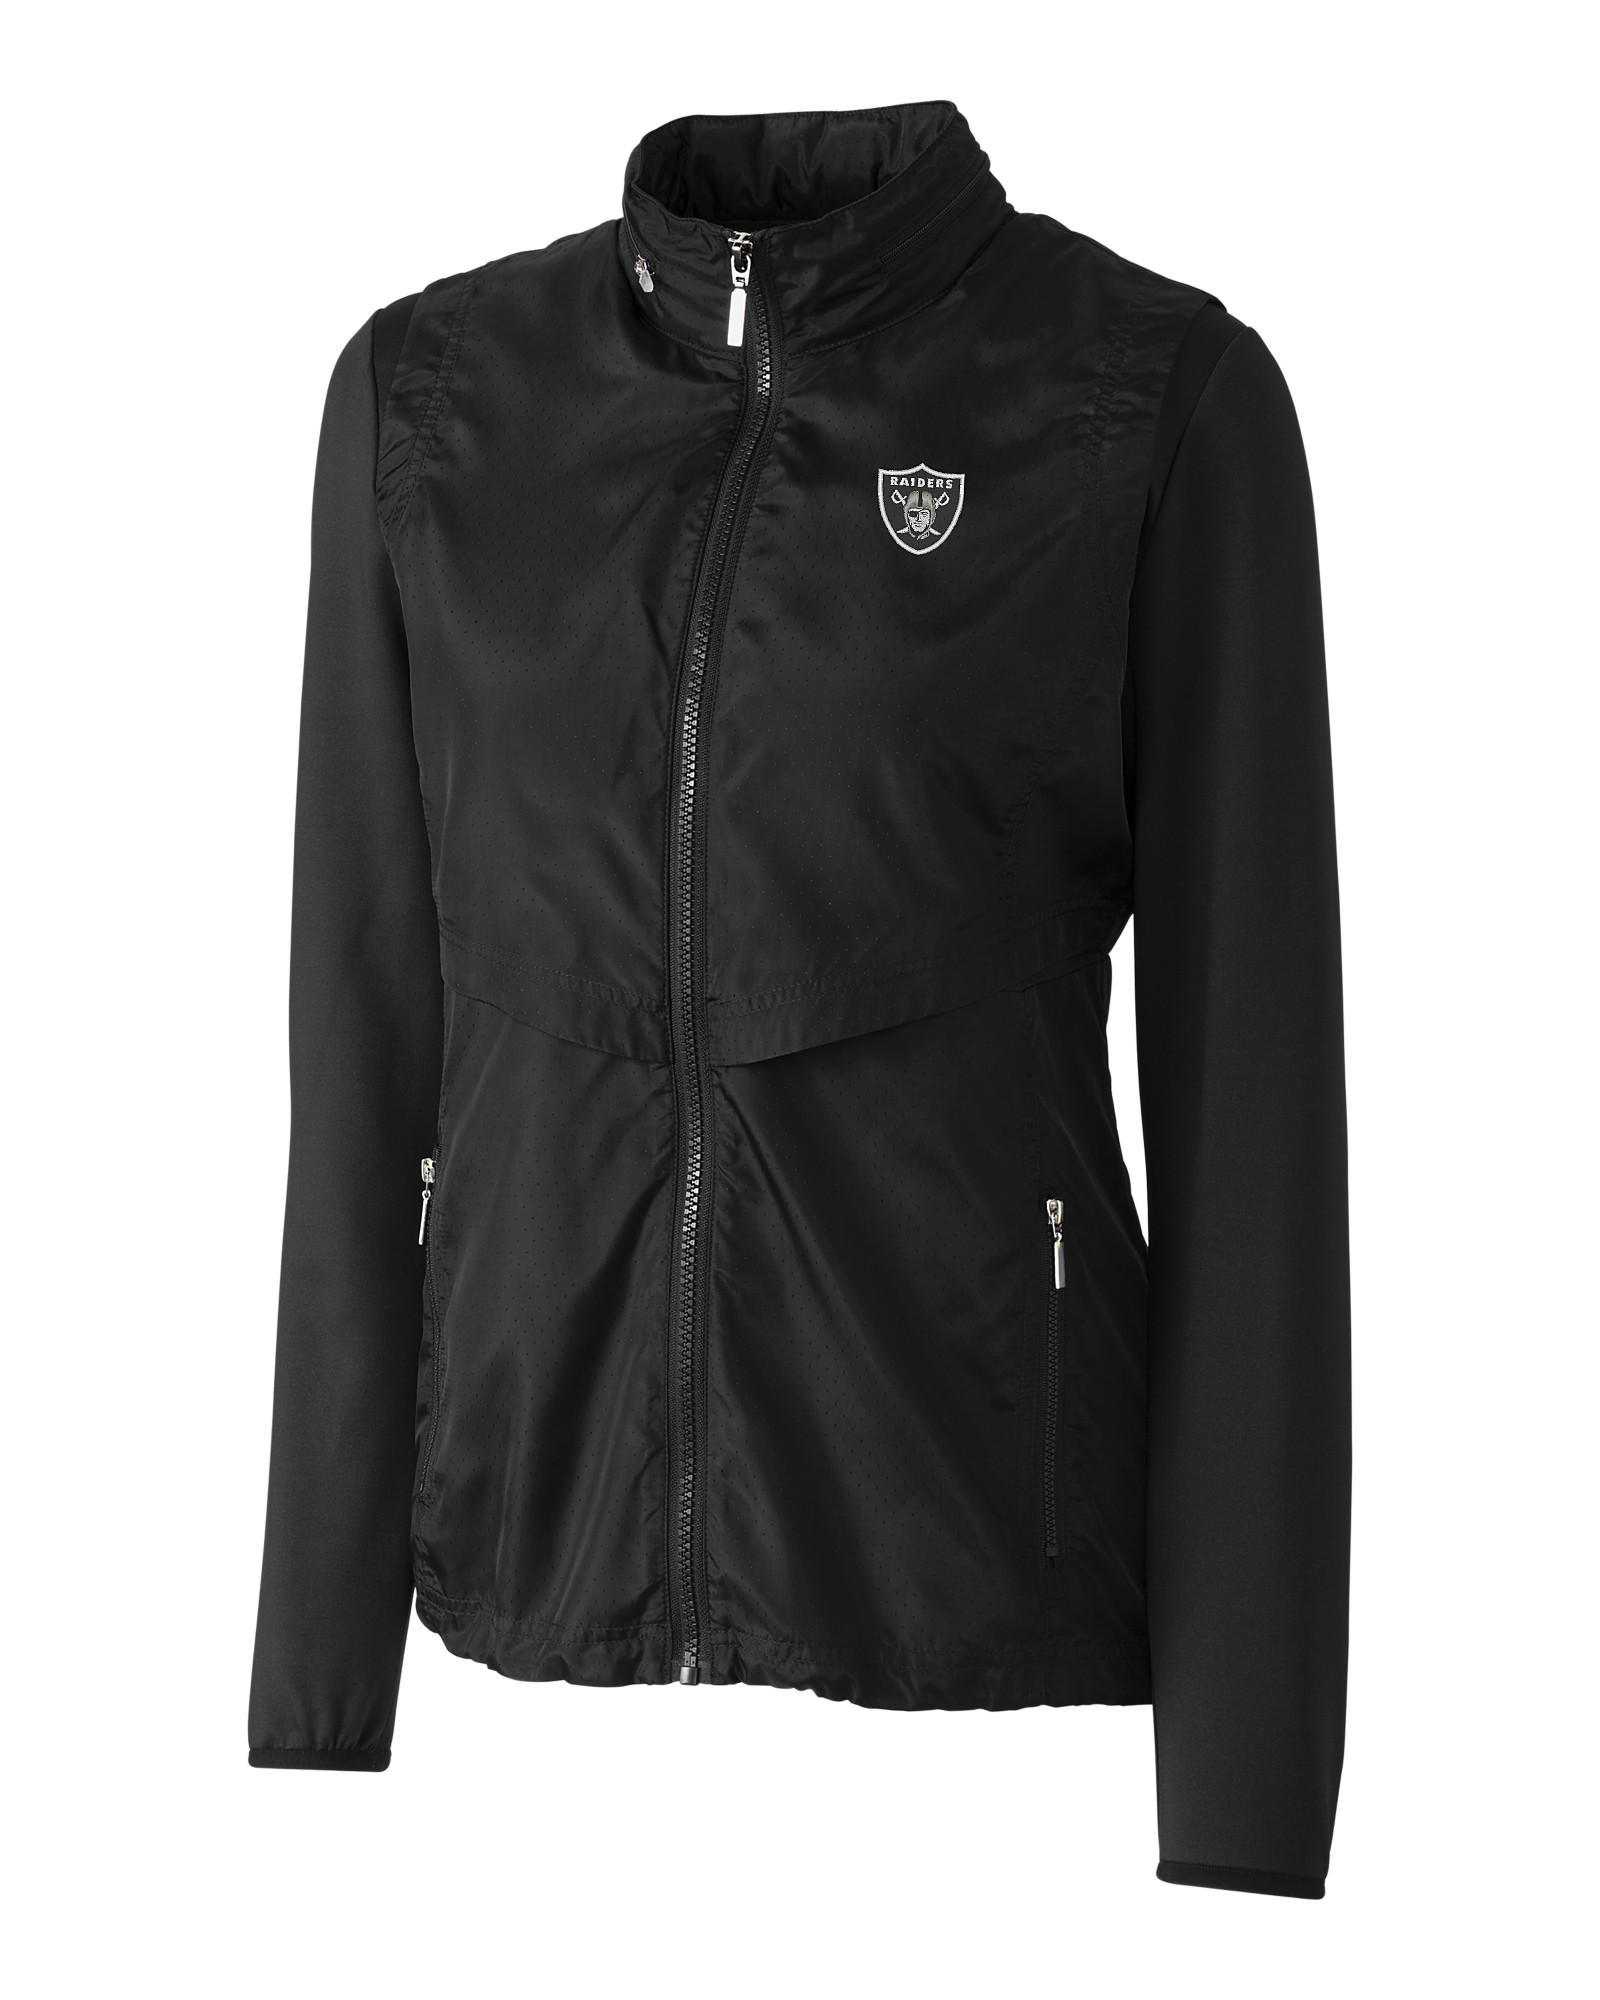 hot sale online fa5c0 00cc6 Oakland Raiders Ladies' Ava Hybrid Full Zip